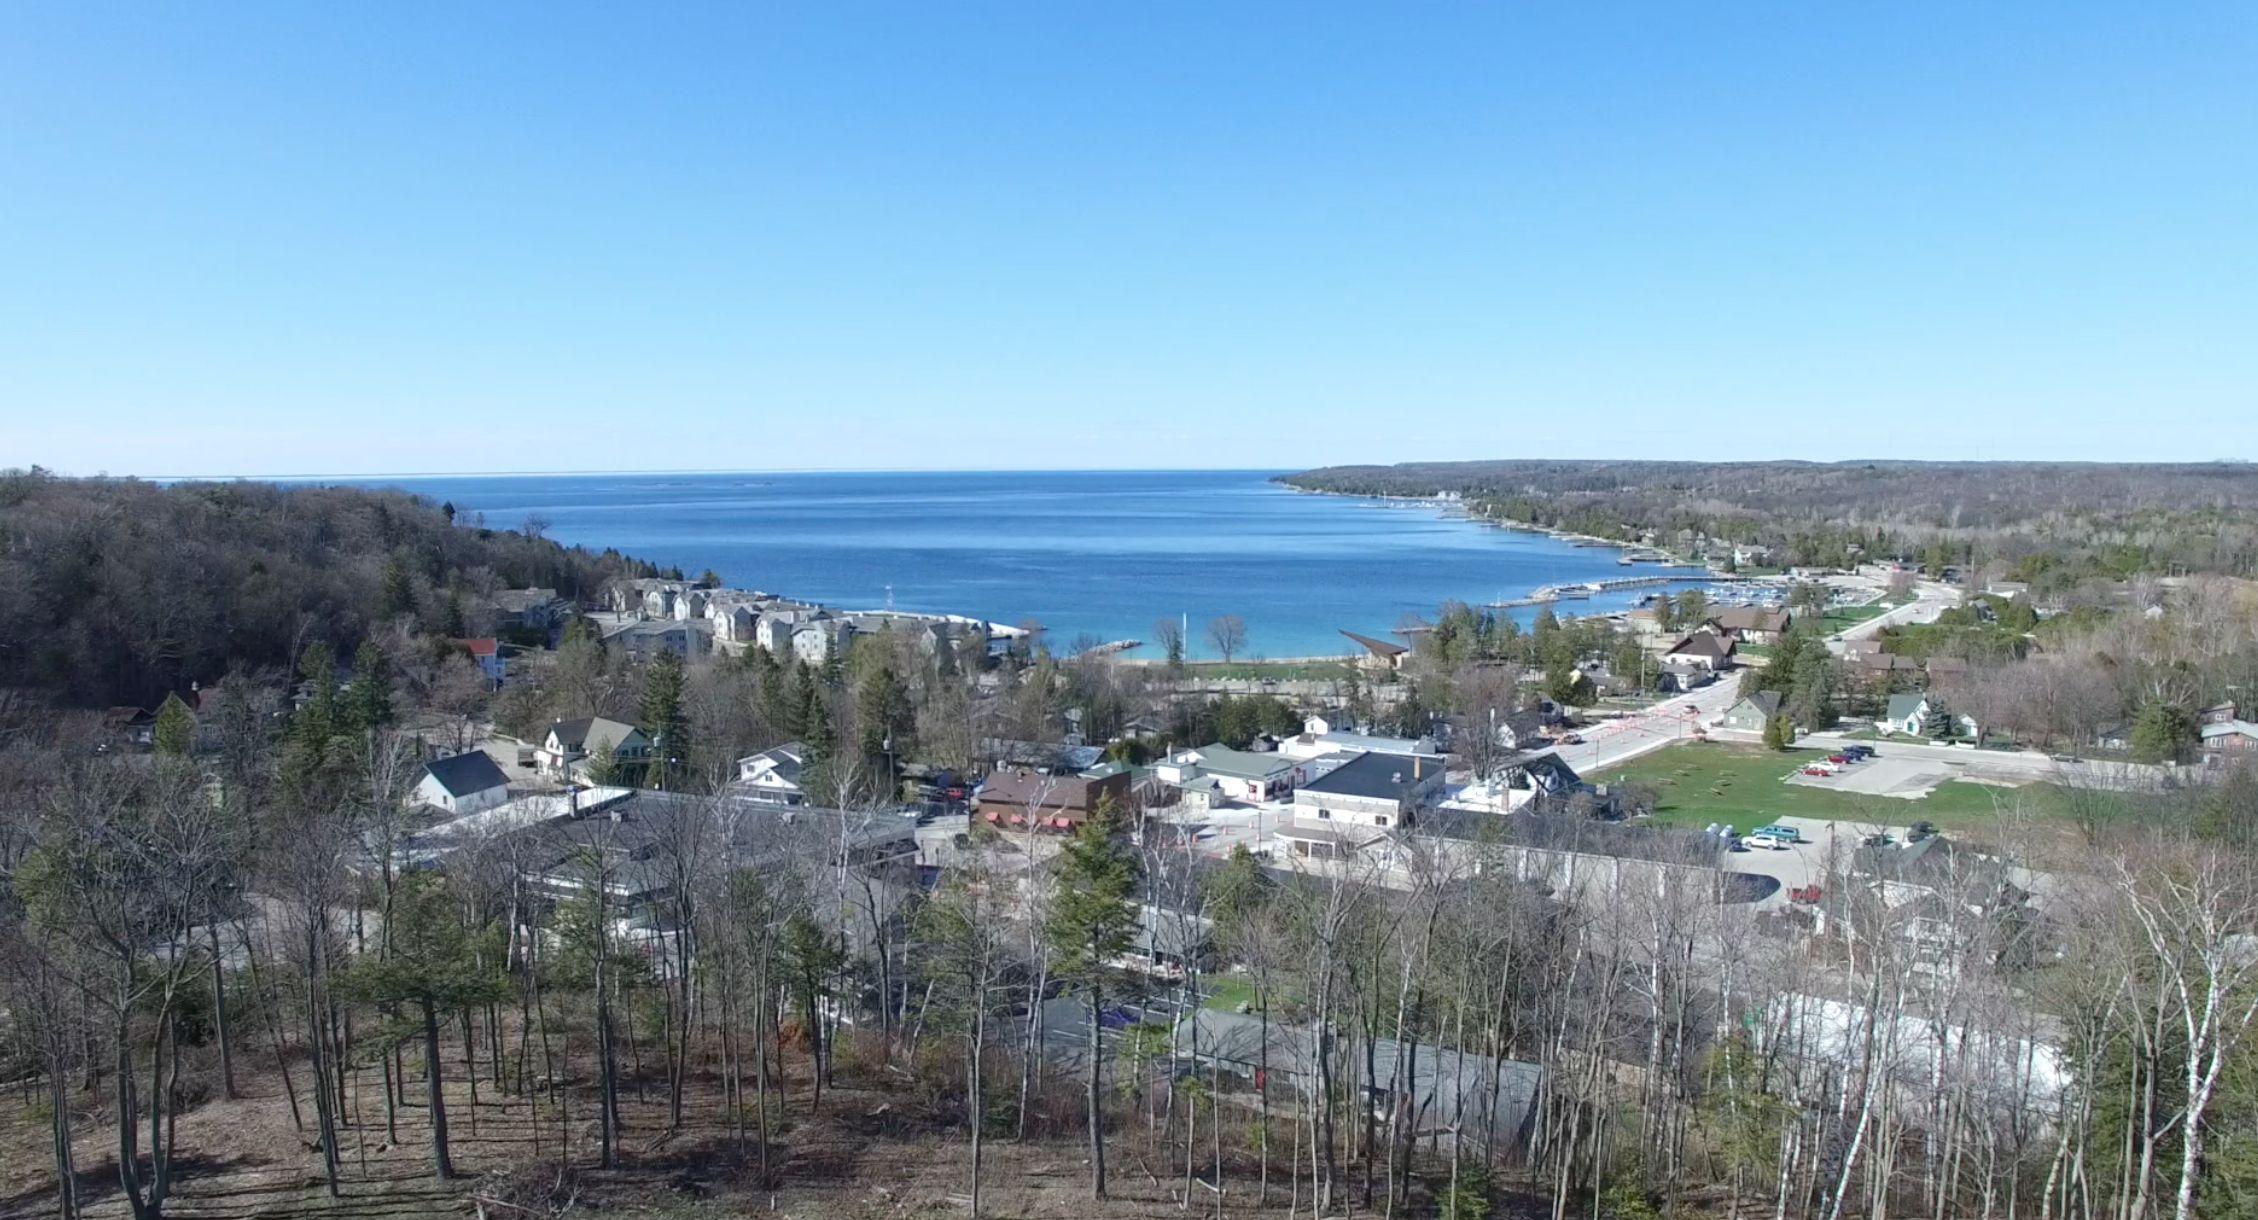 Pin By David Kaster On Ilovedoorcounty Com Harbor View Sister Bay Views